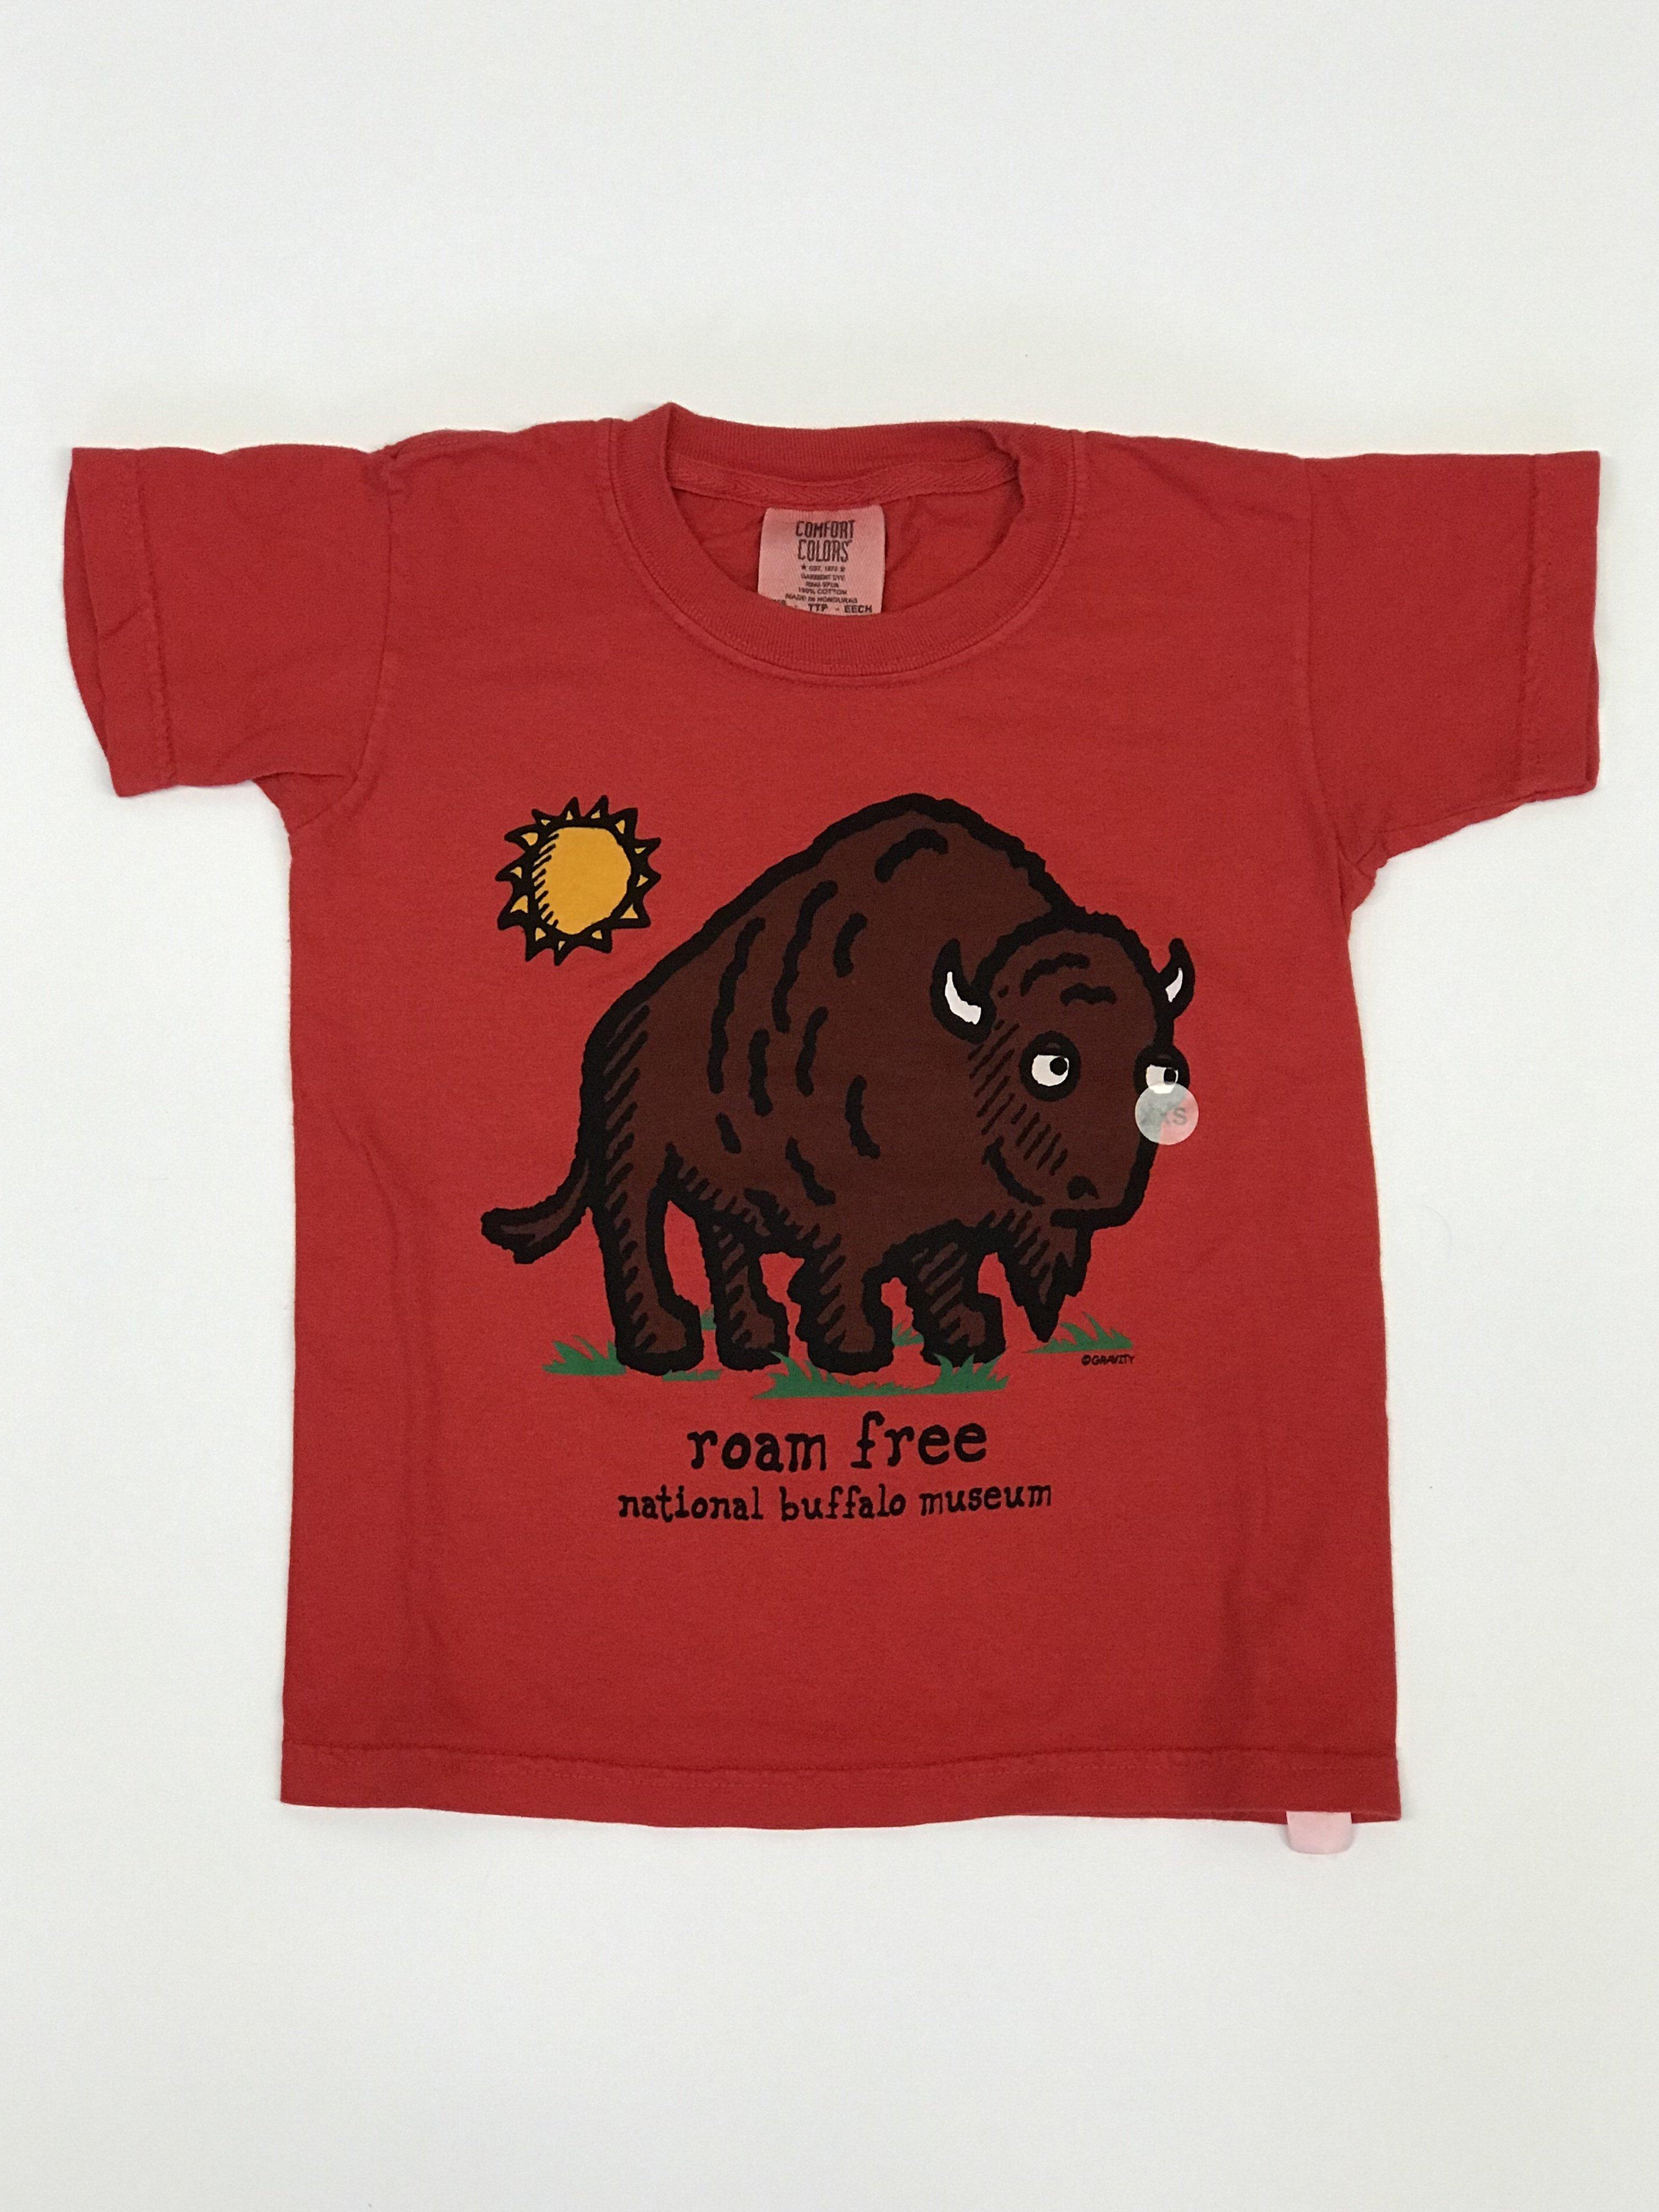 Roam Free T-Shirt 8576-8577-8578-8578-8580